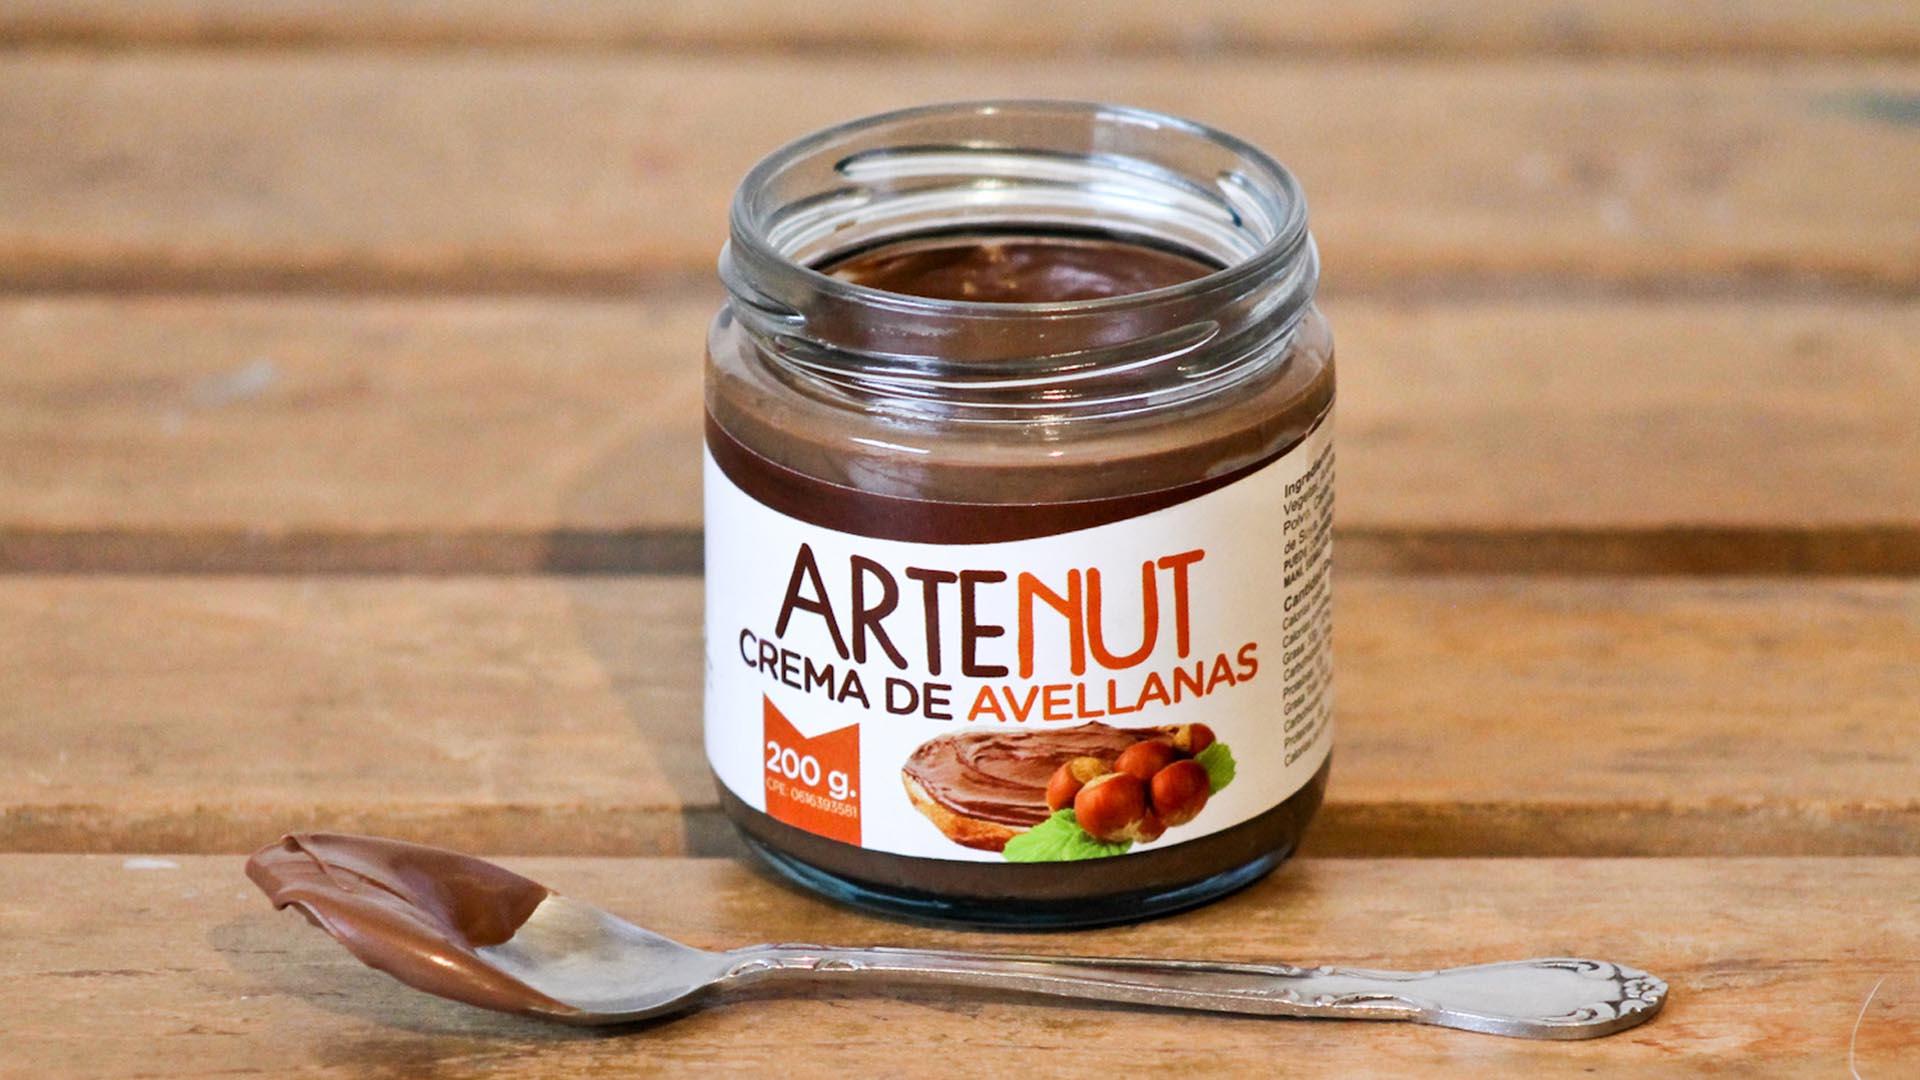 Crema de avellanas Artenut de Artekao